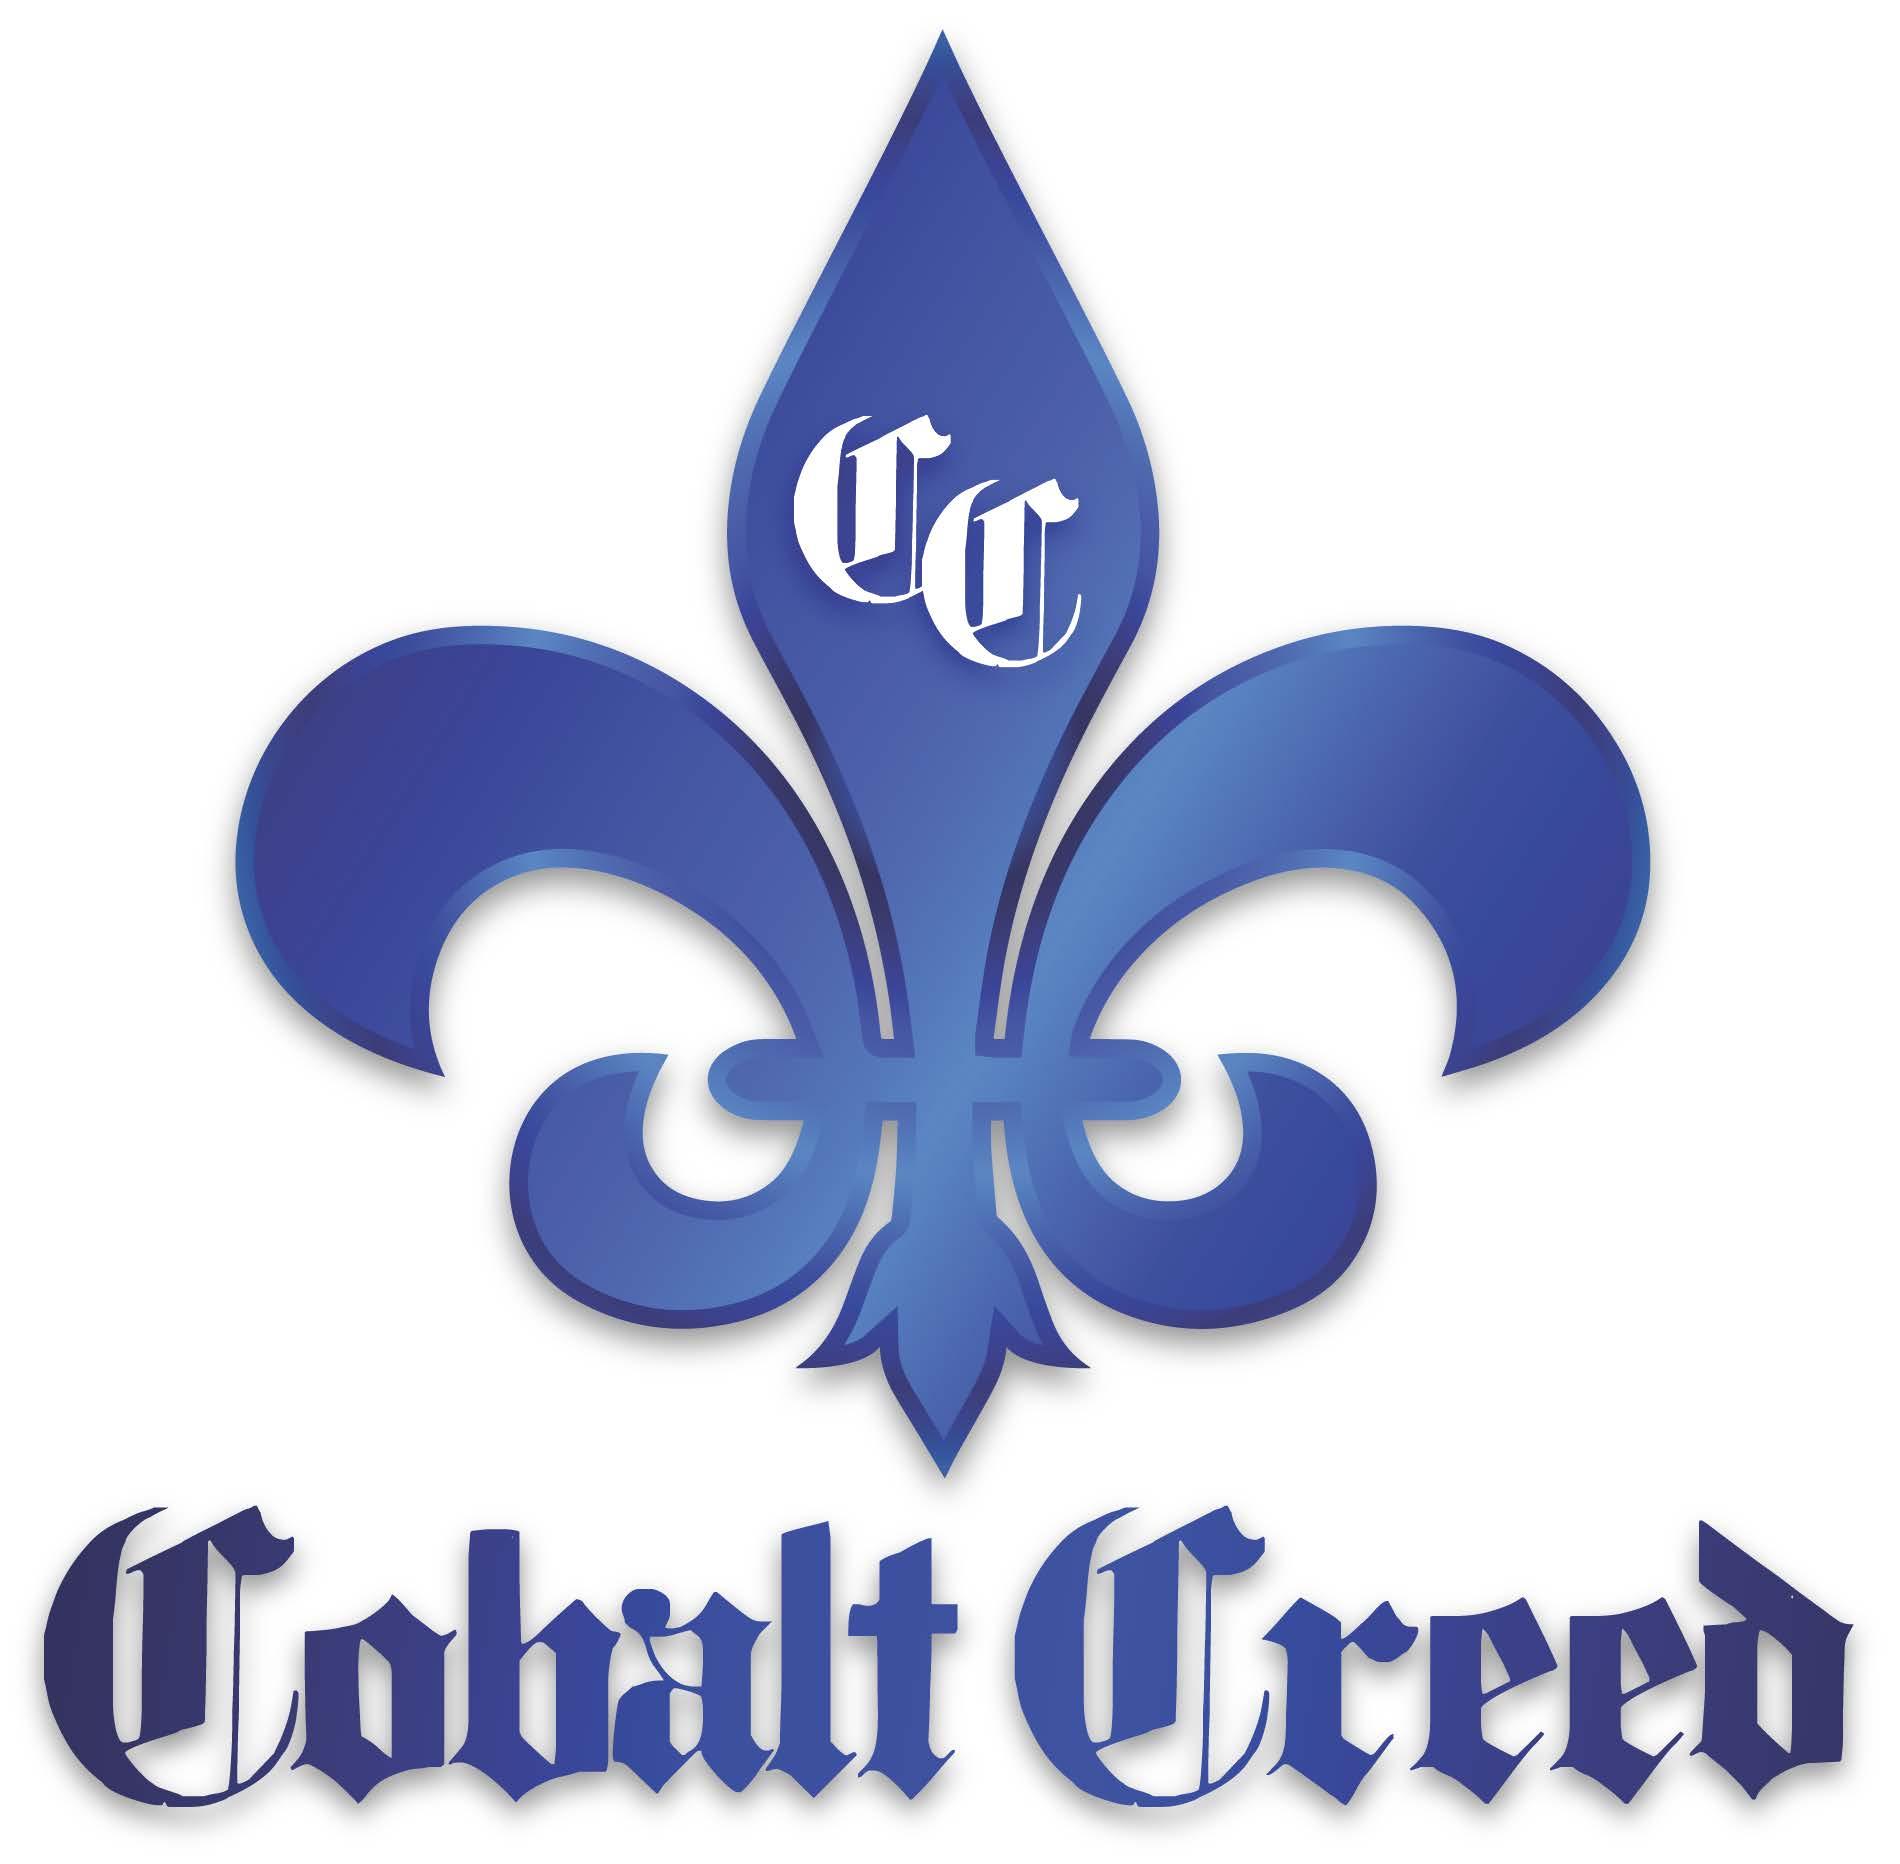 Cobalt Creed Logo